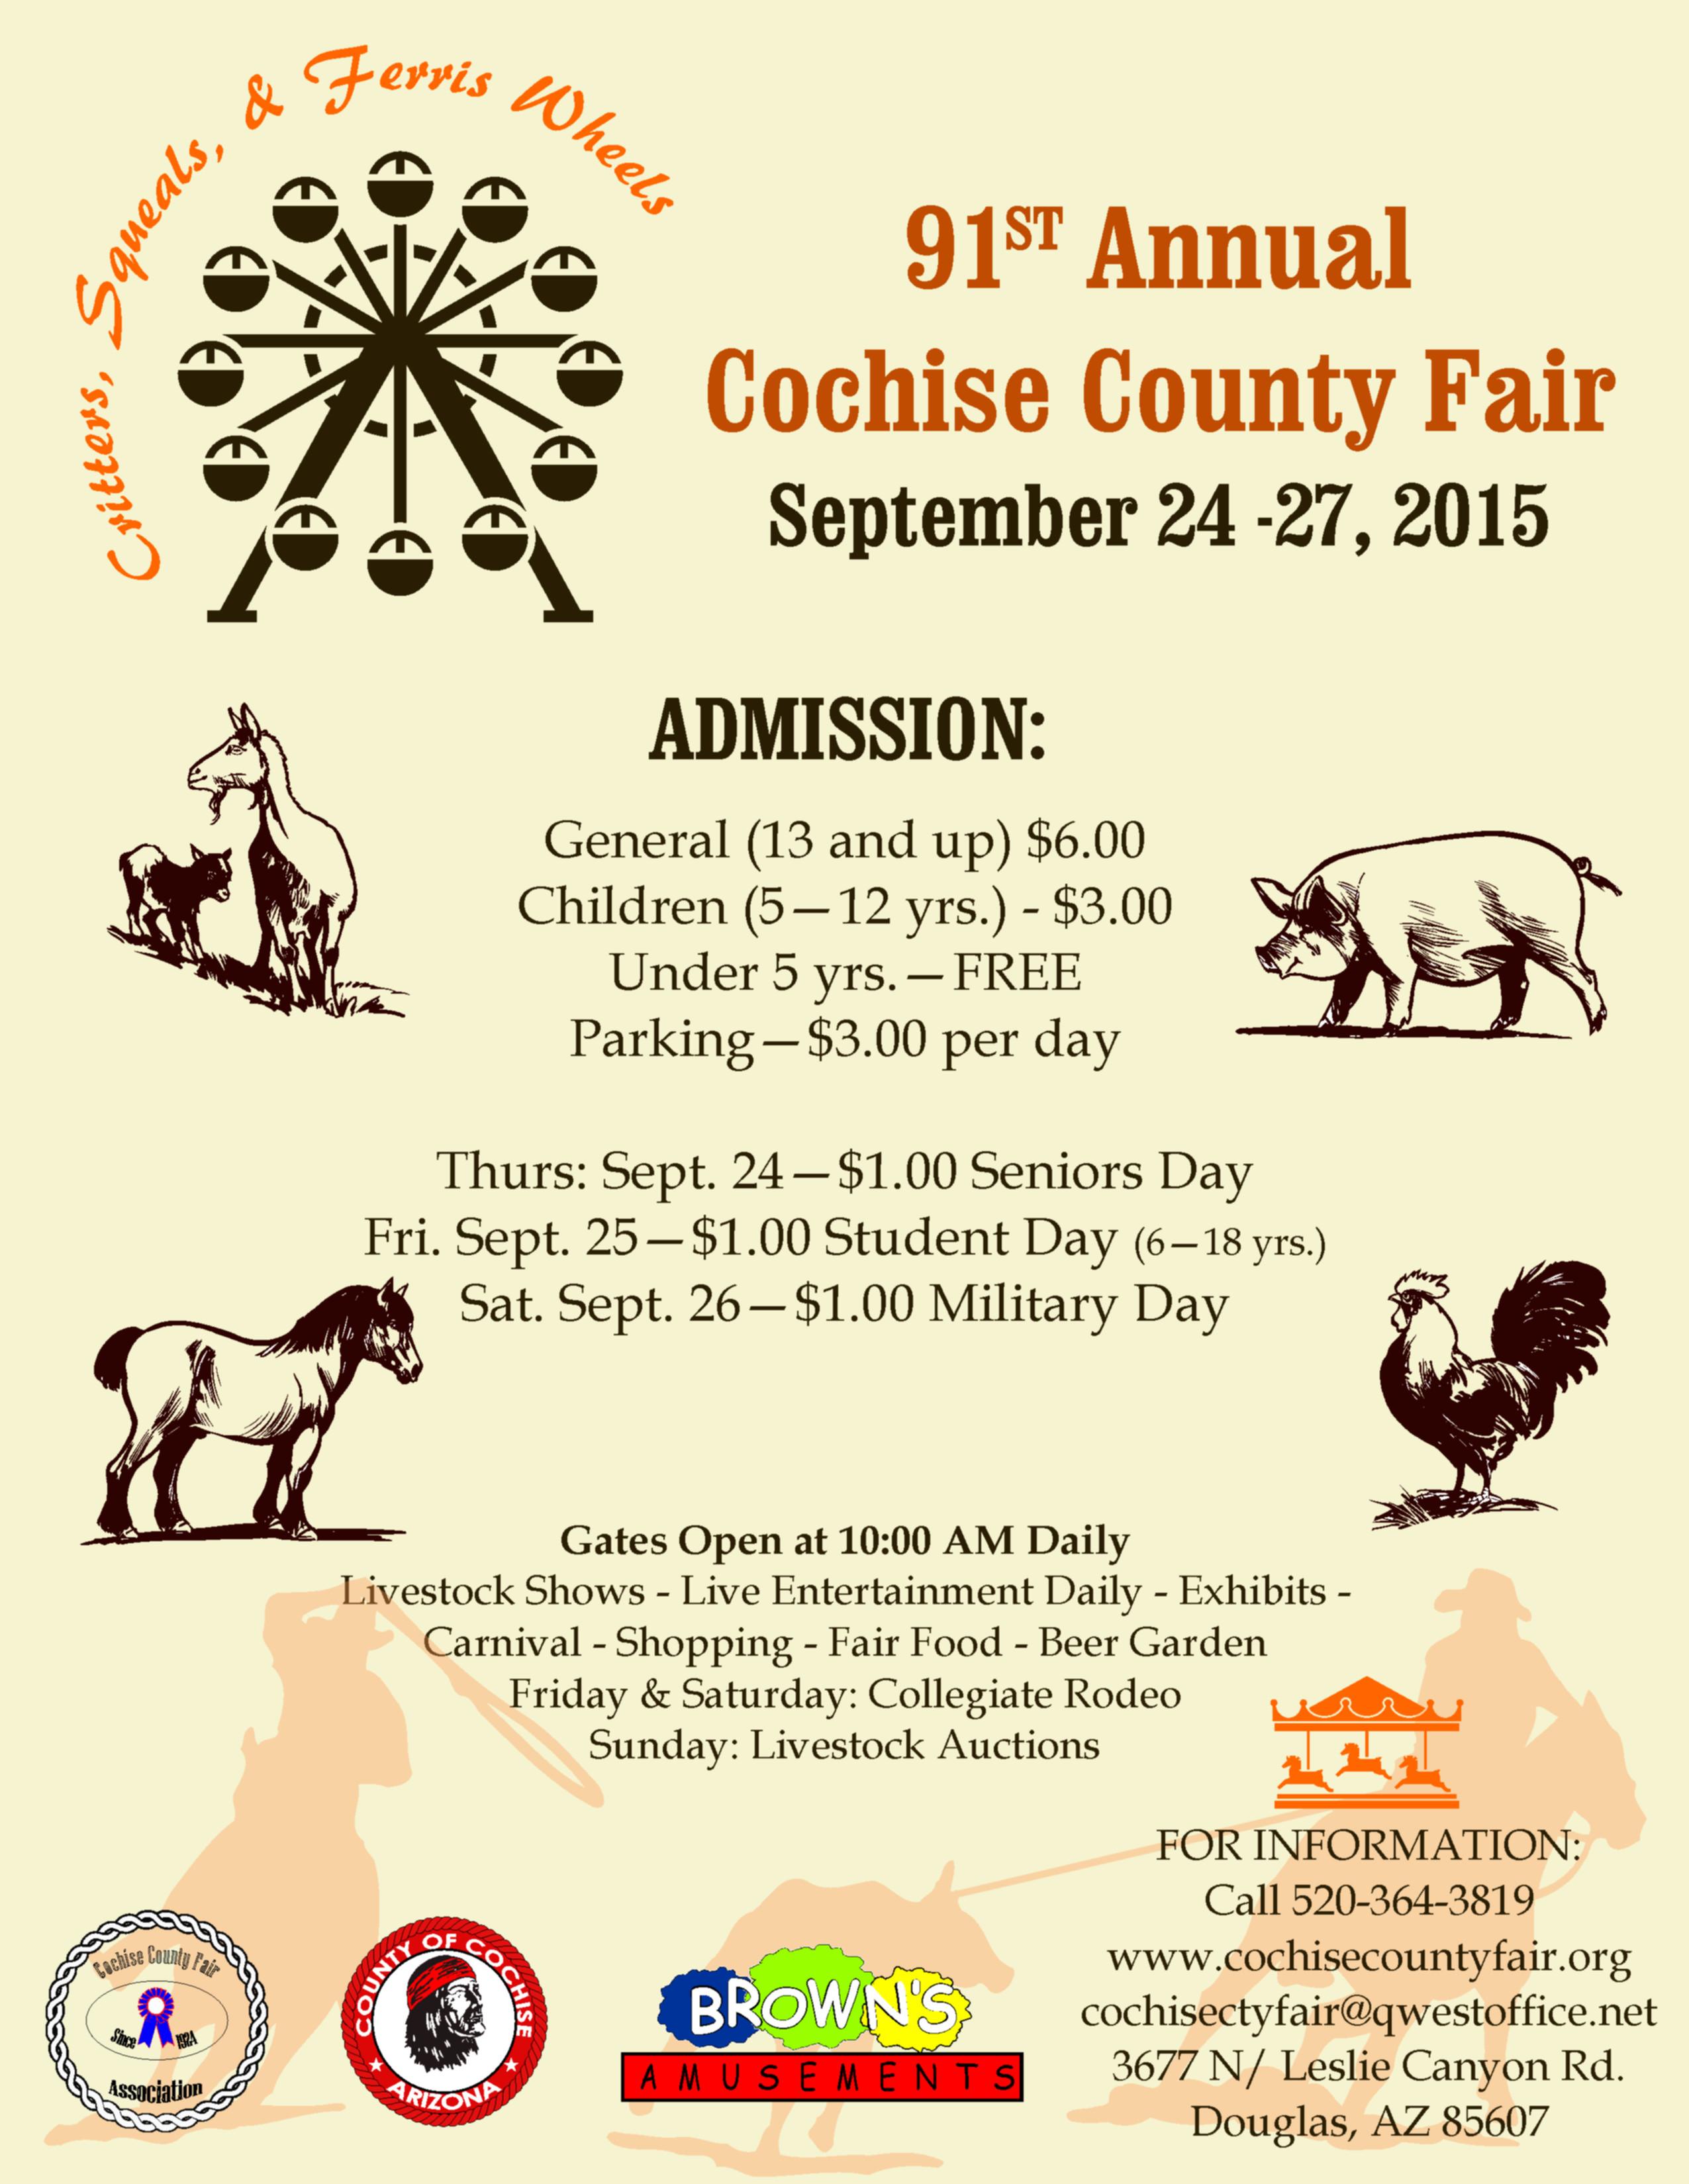 Arizona cochise county cochise - Arizona Cochise County Cochise 43